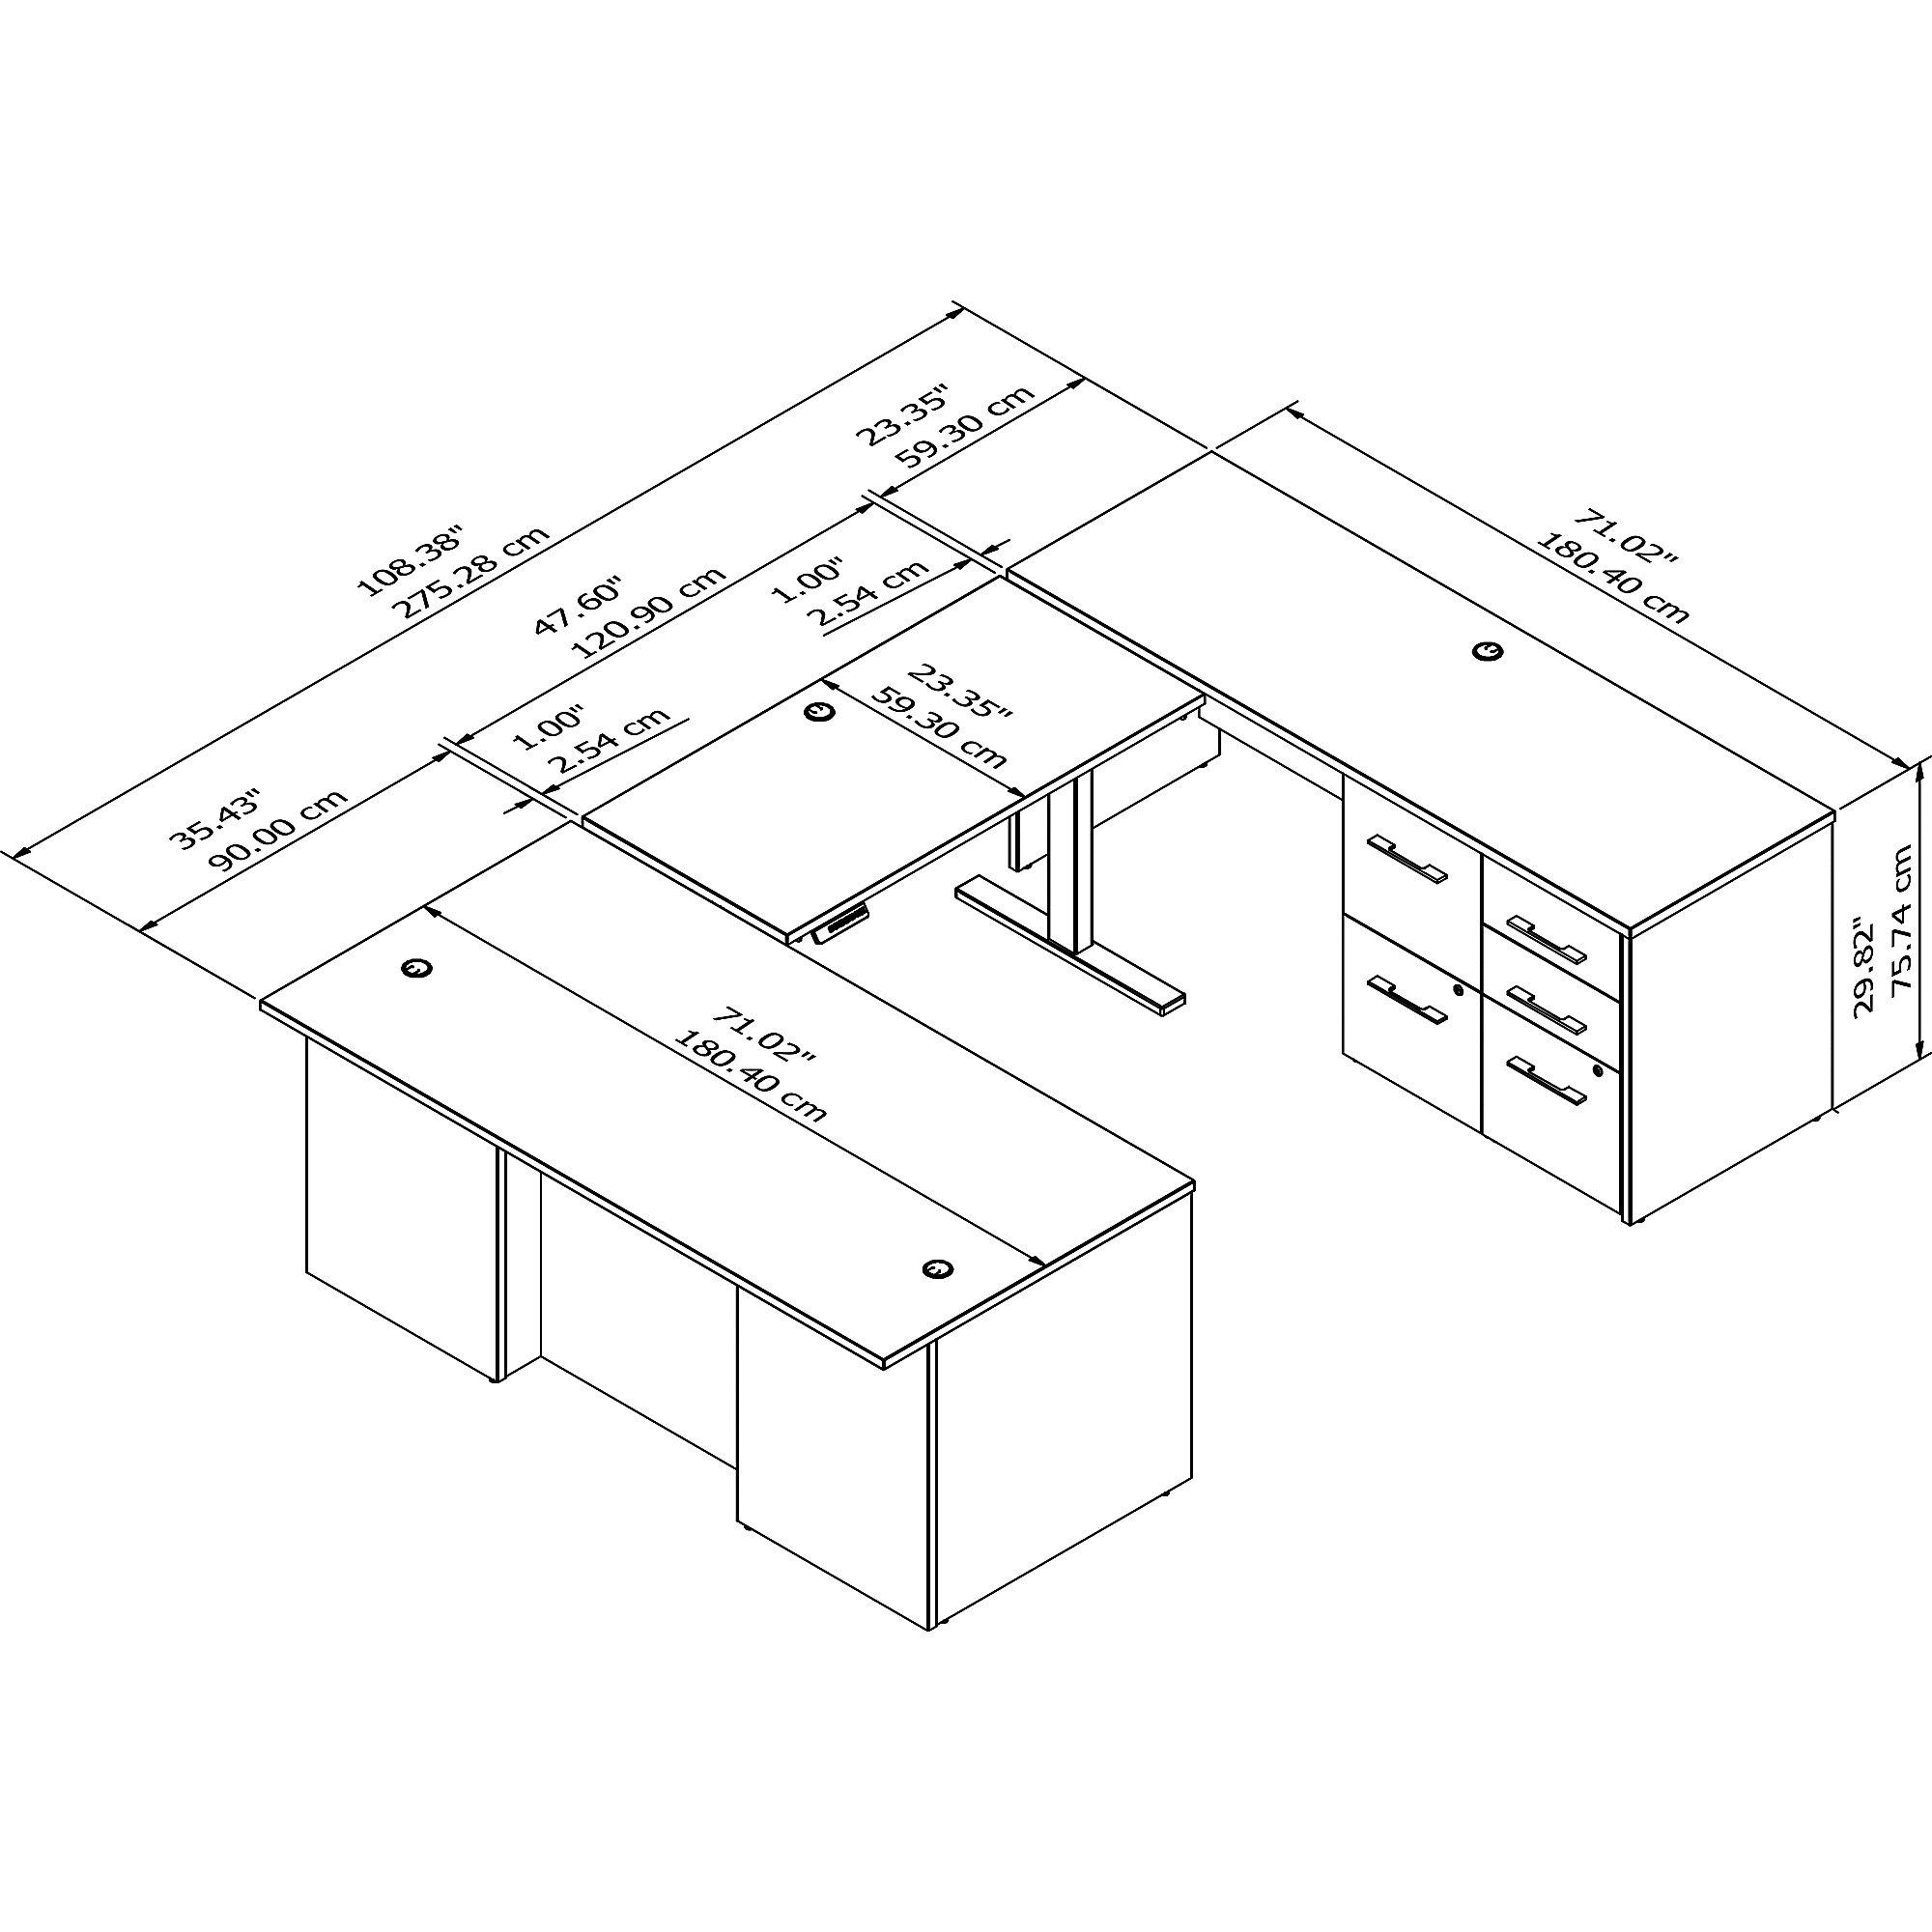 height adjustable office 500 u-desk dimensions